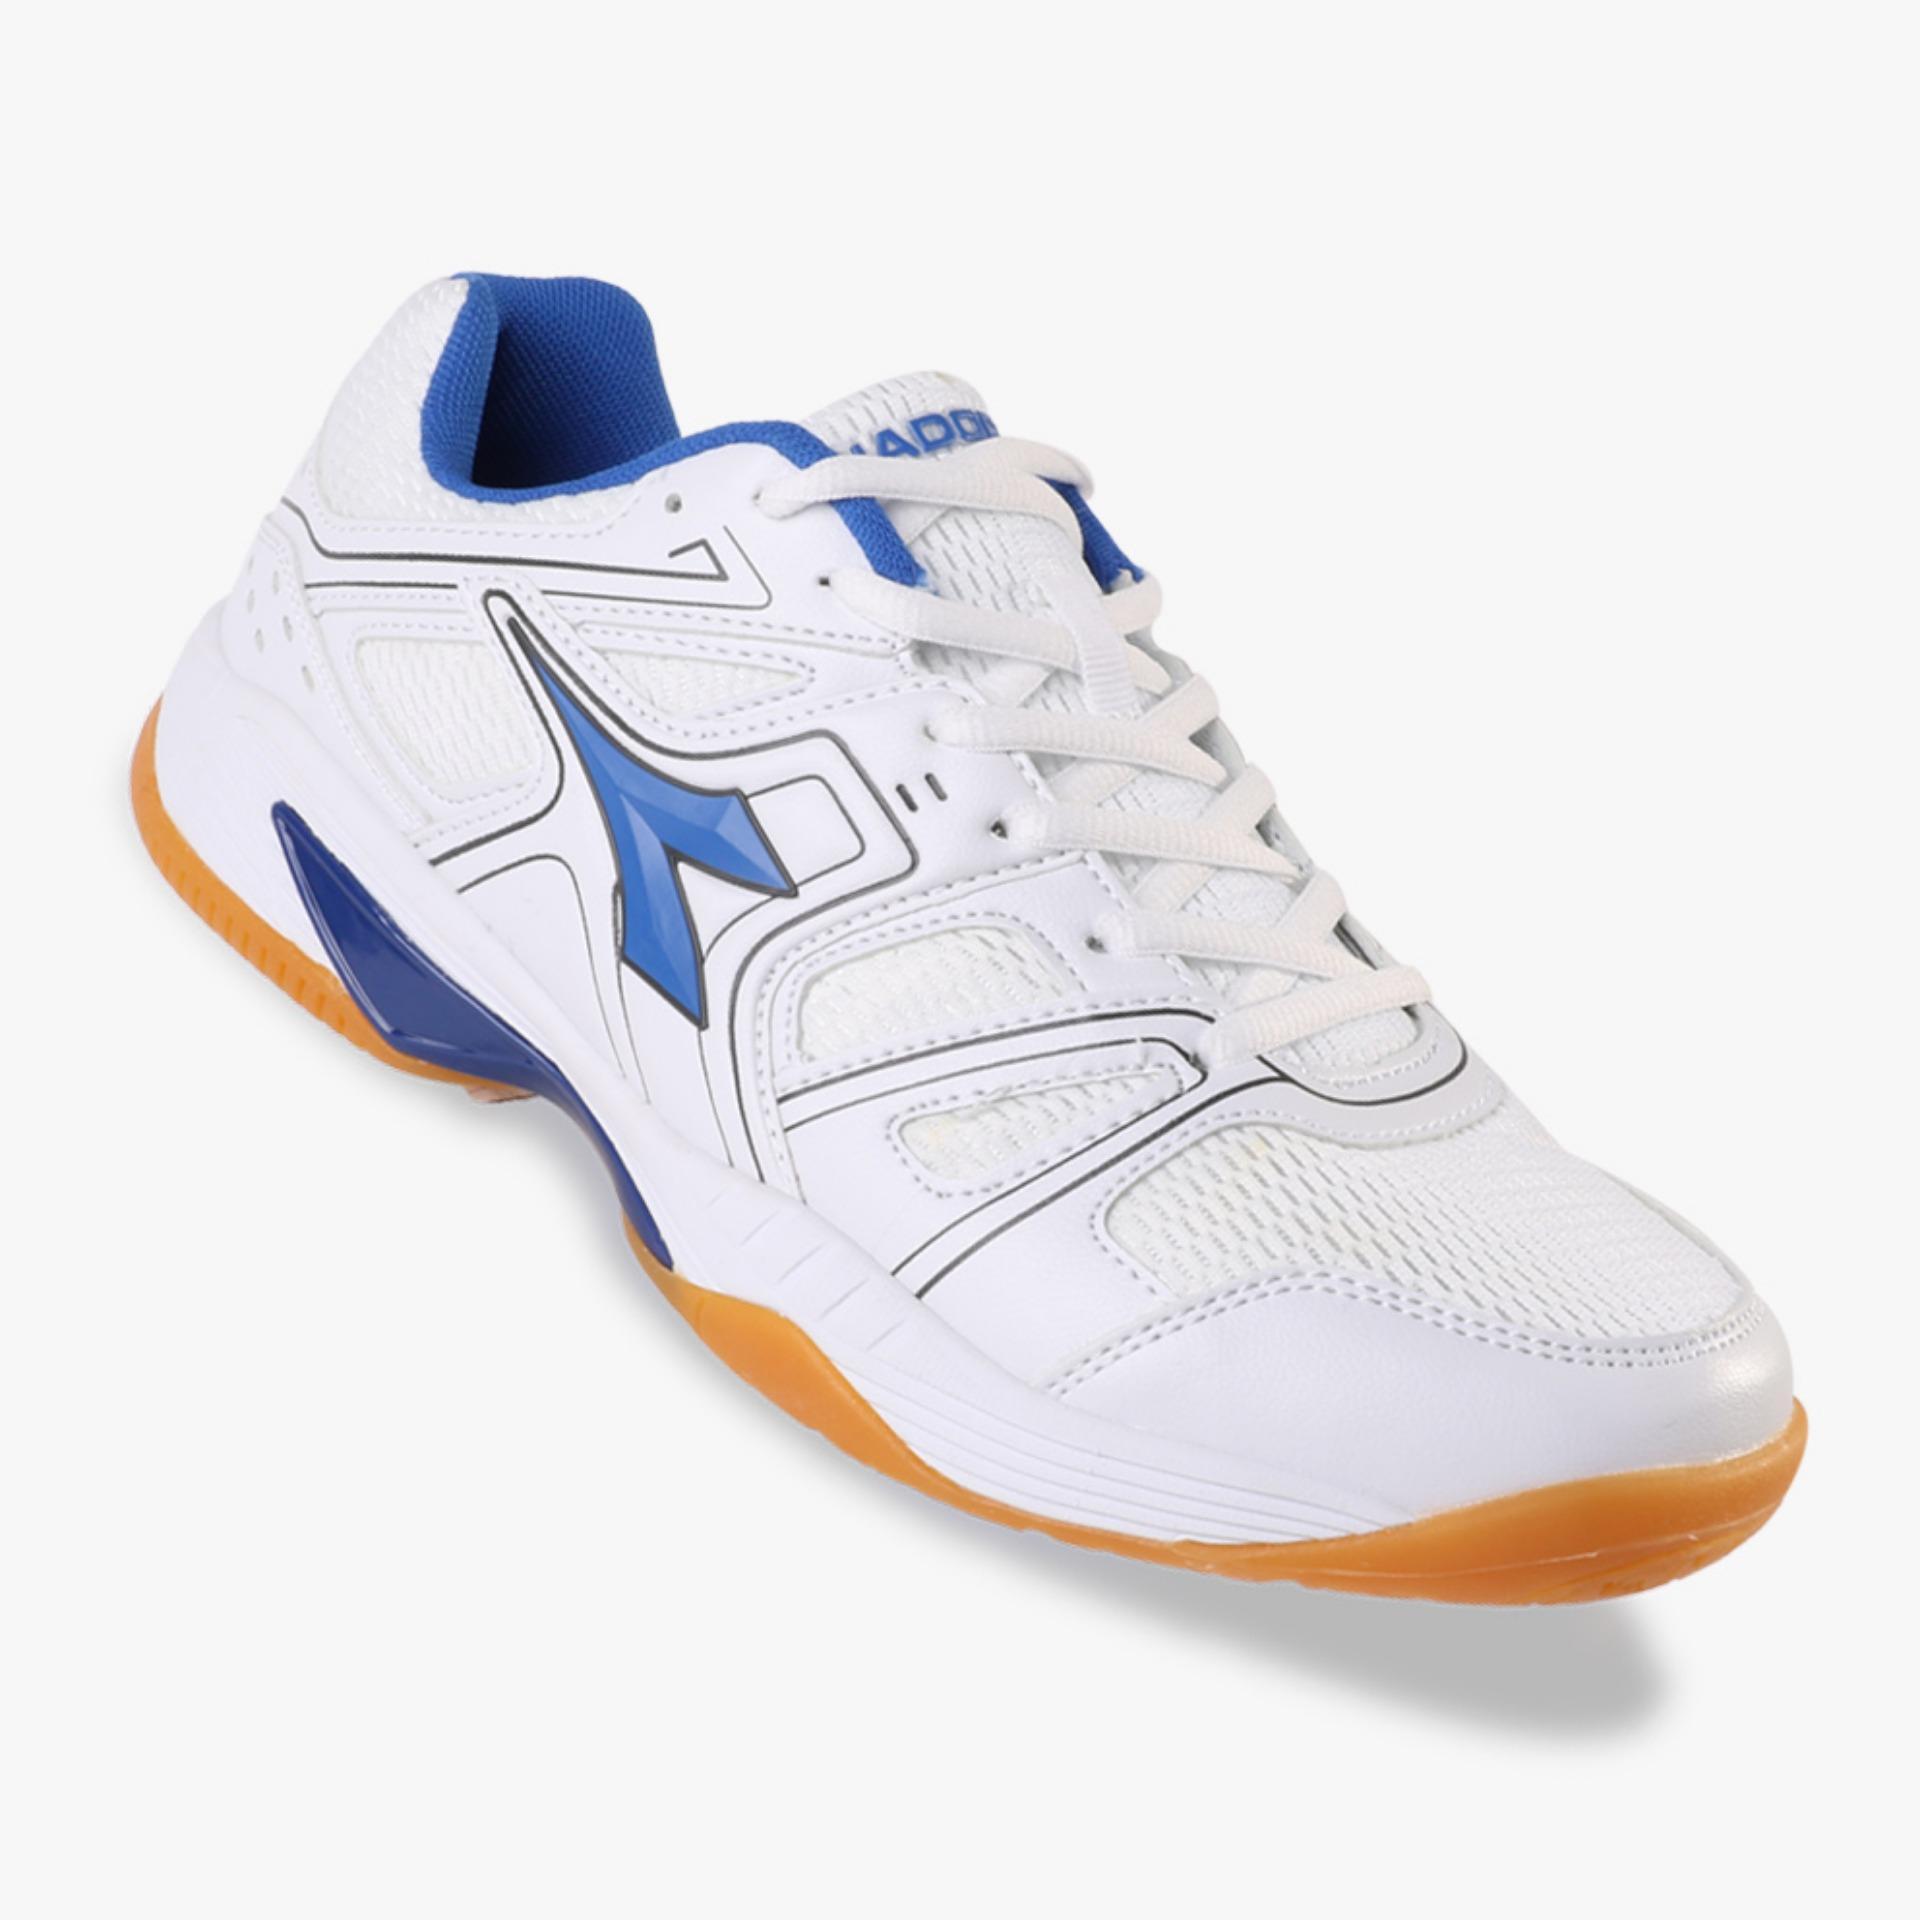 Jual Diadora Marin Men S Badminton Shoes Putih